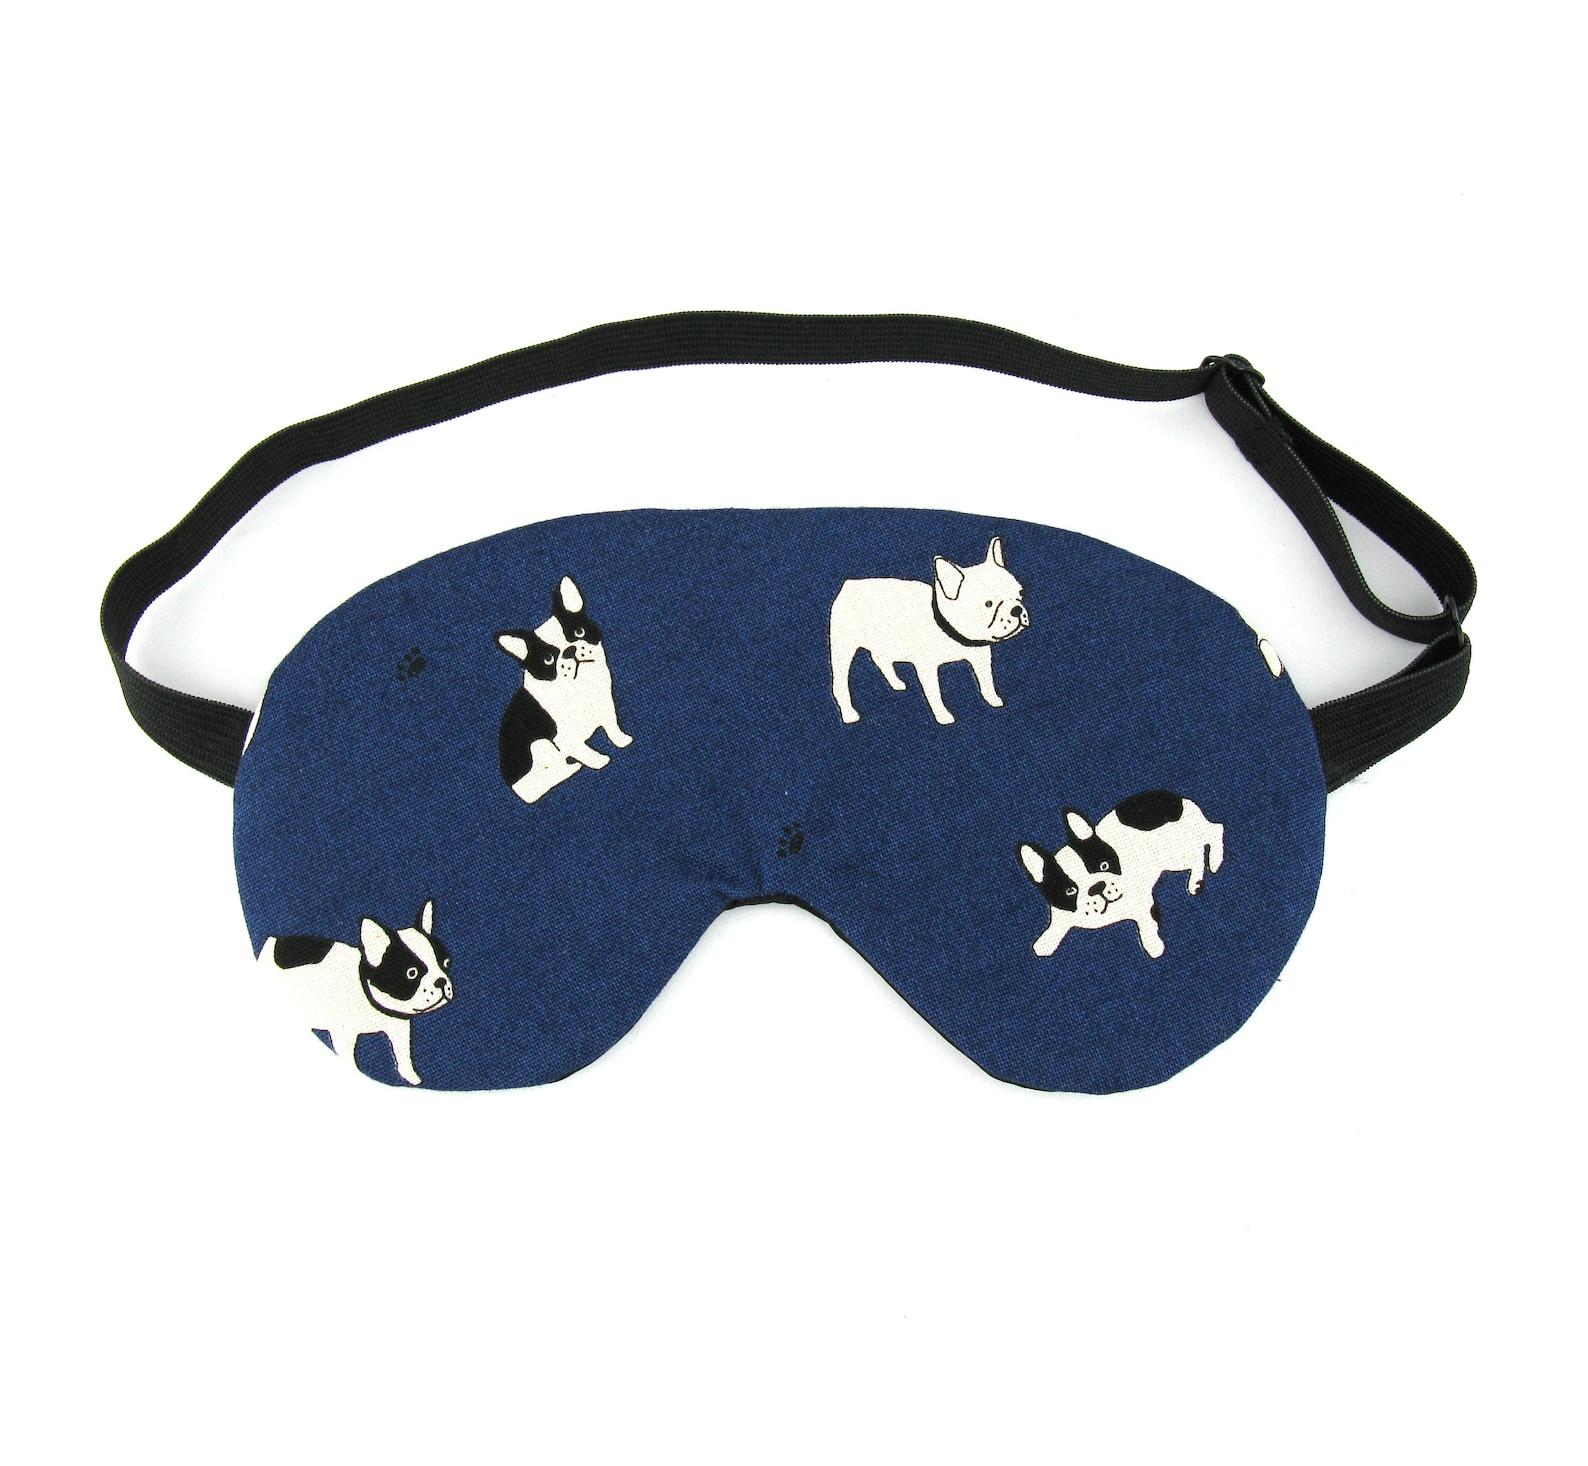 French Bulldog Sleep Eye Mask